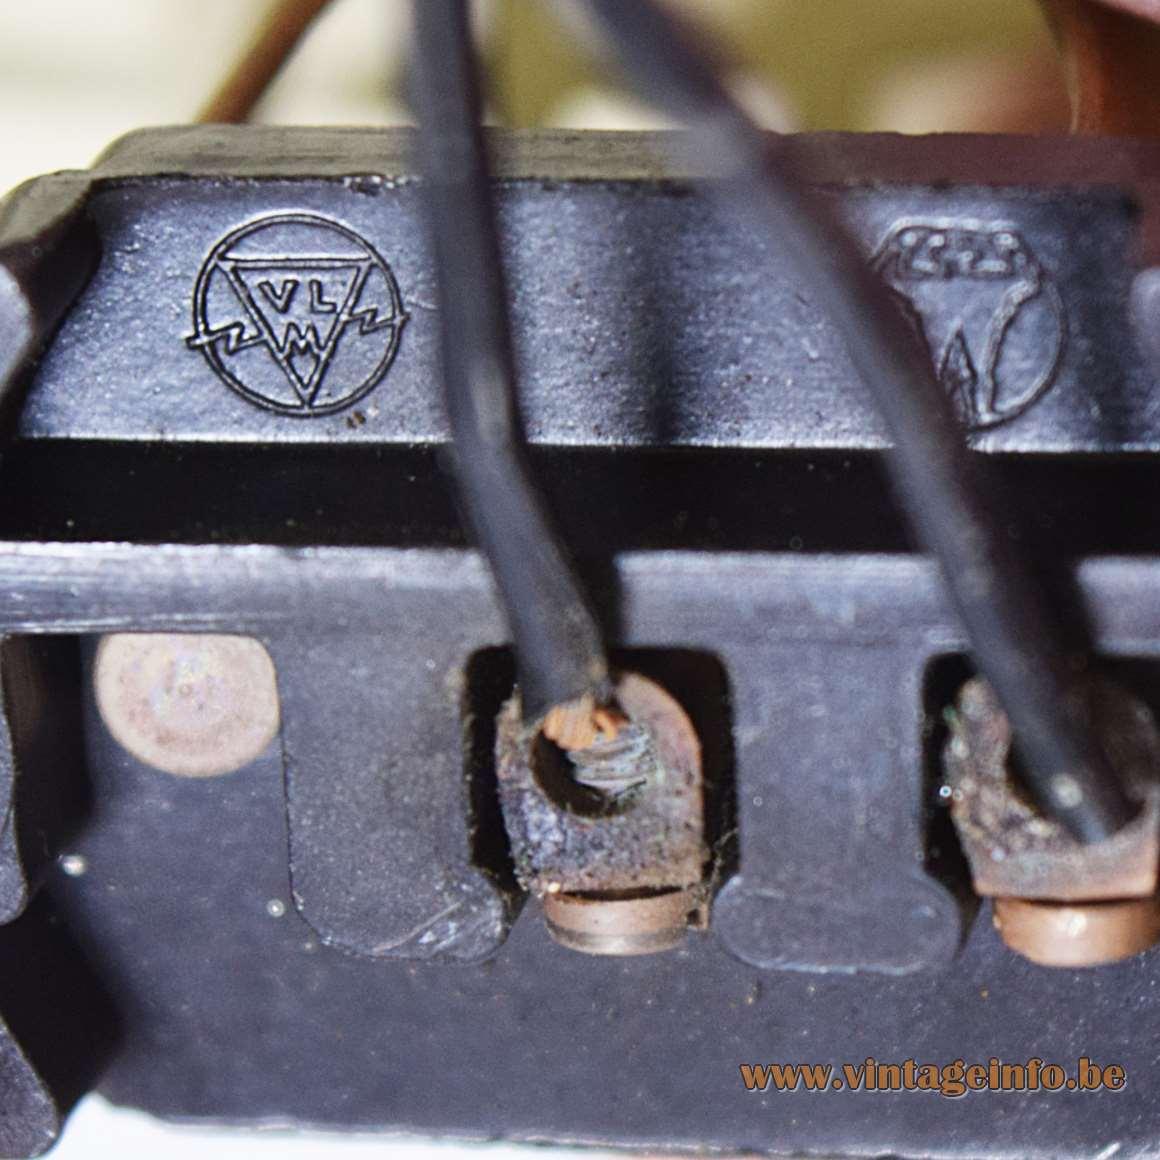 1950s Lantern Pendant Light - VLM Components socket